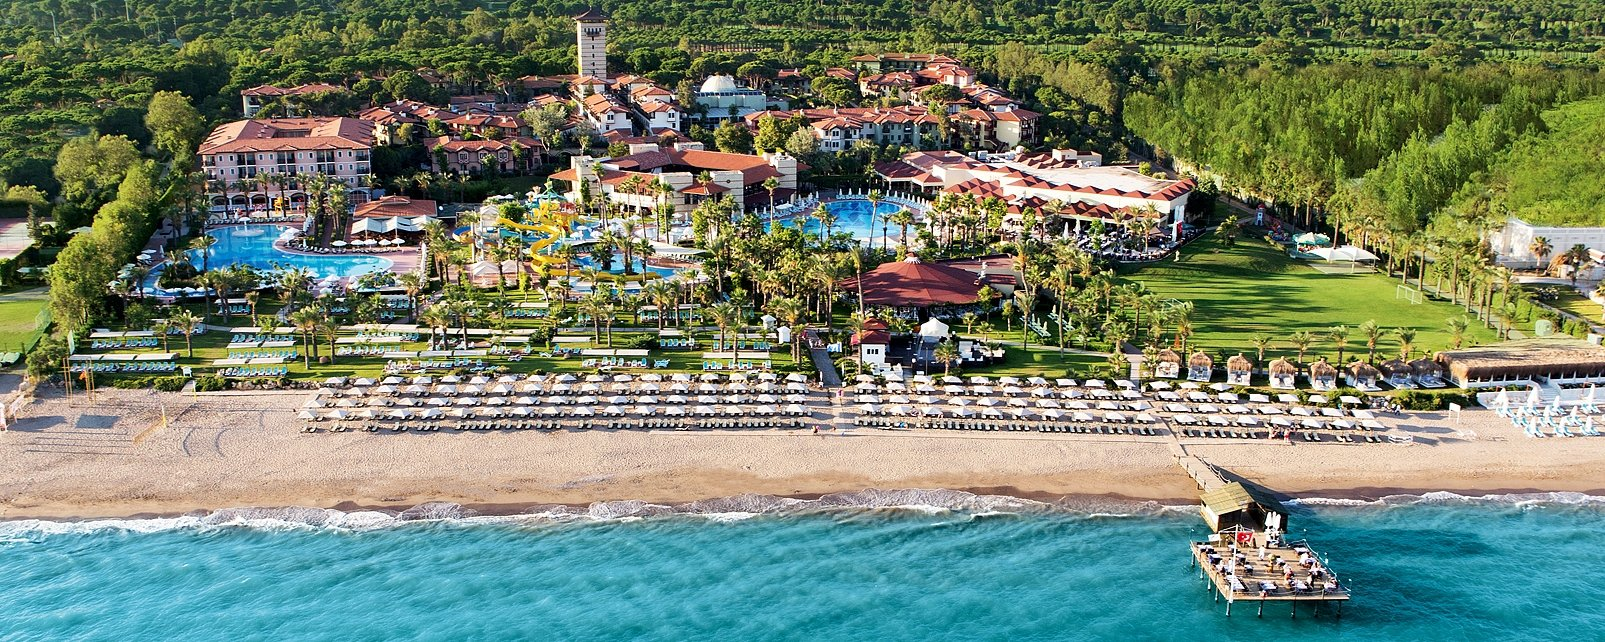 Hotel Paloma Grida Resort & Spa